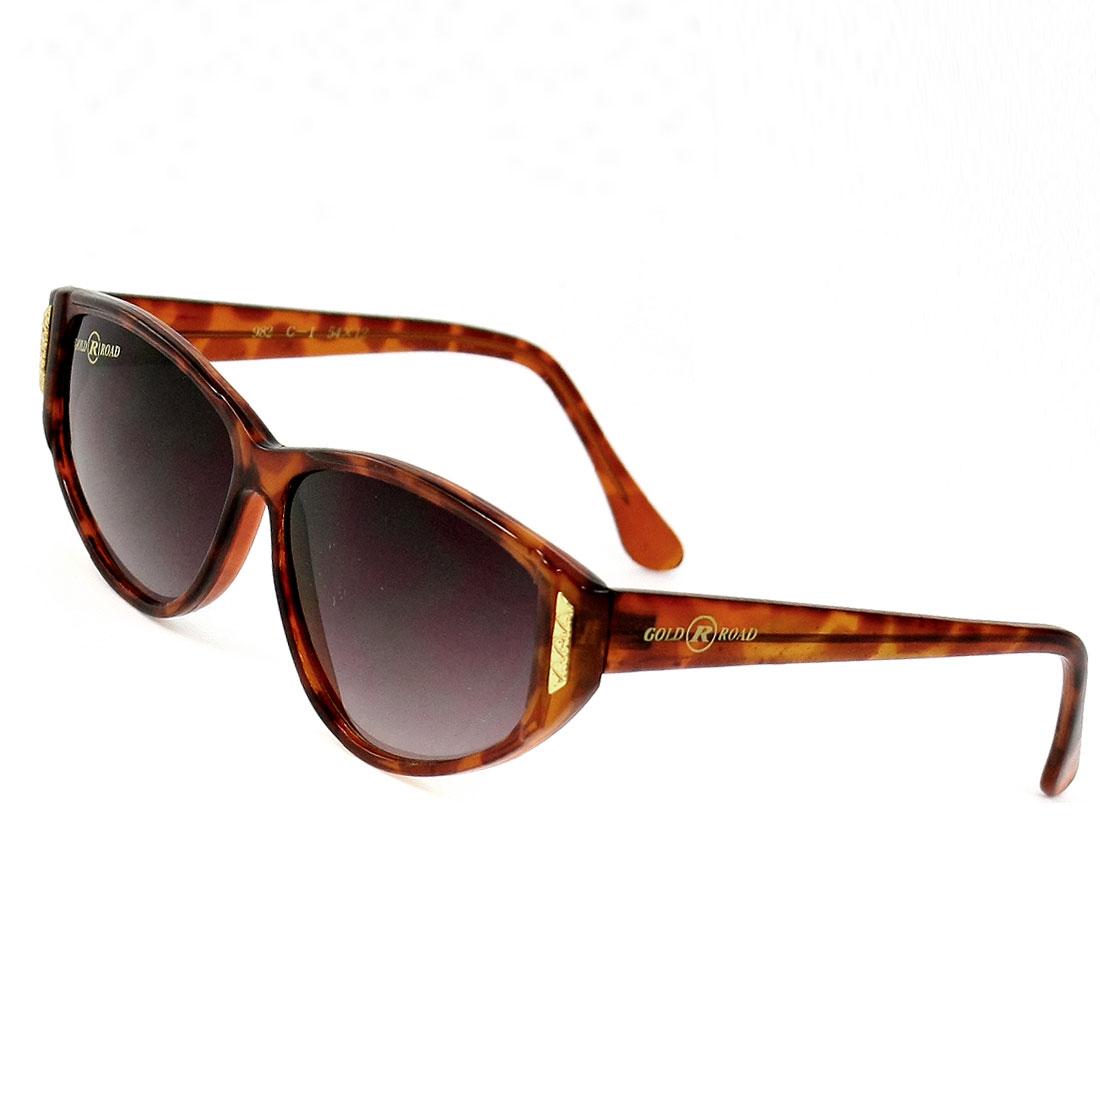 Women Waterdrop Lens Brown Plastic Leopard Prints Single Bridge Sunglasses Eyewear